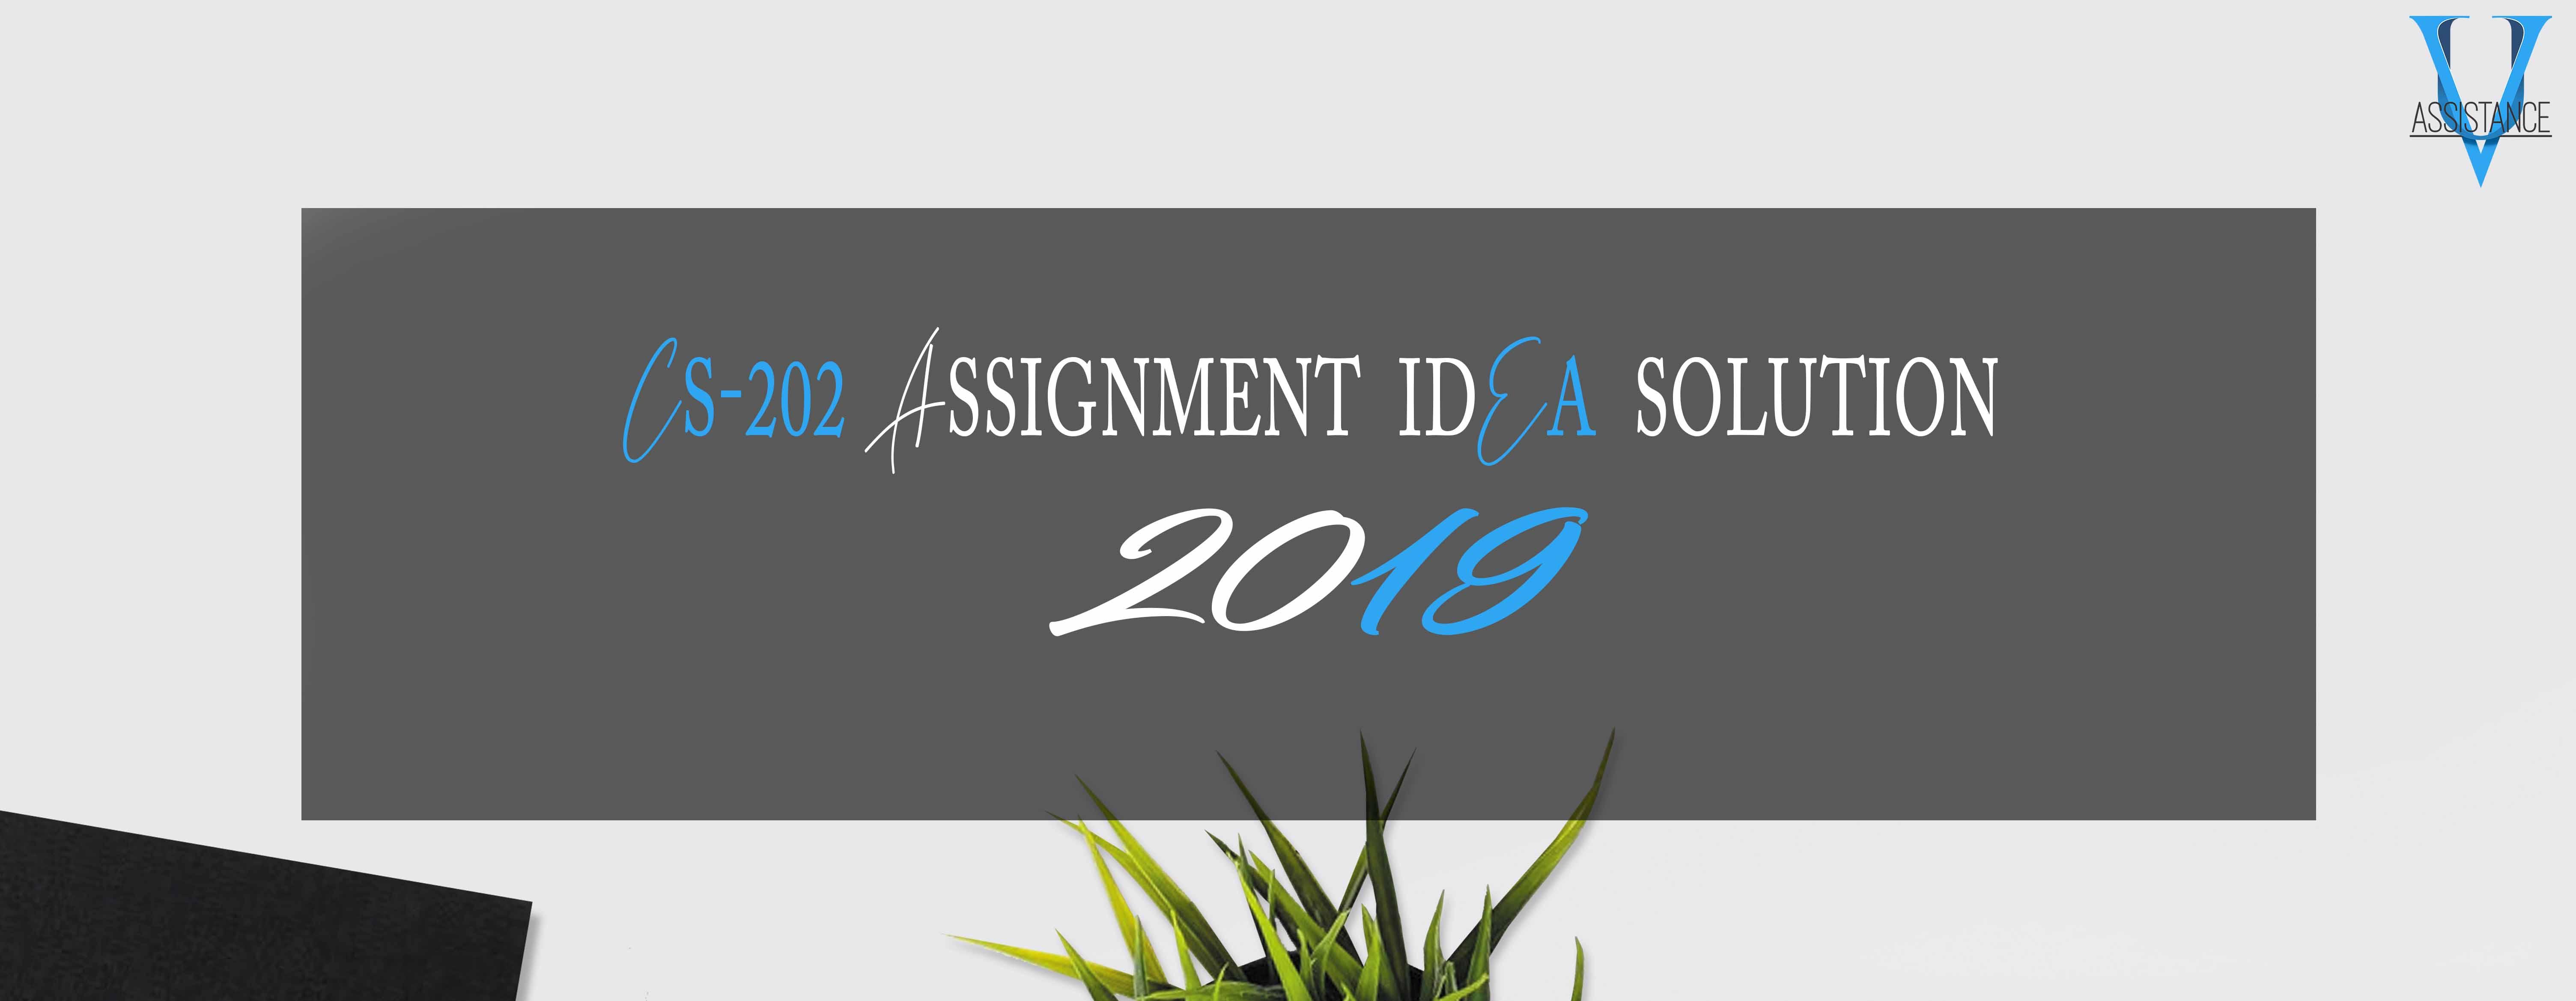 CS202 Assignment 1 Solution 2019